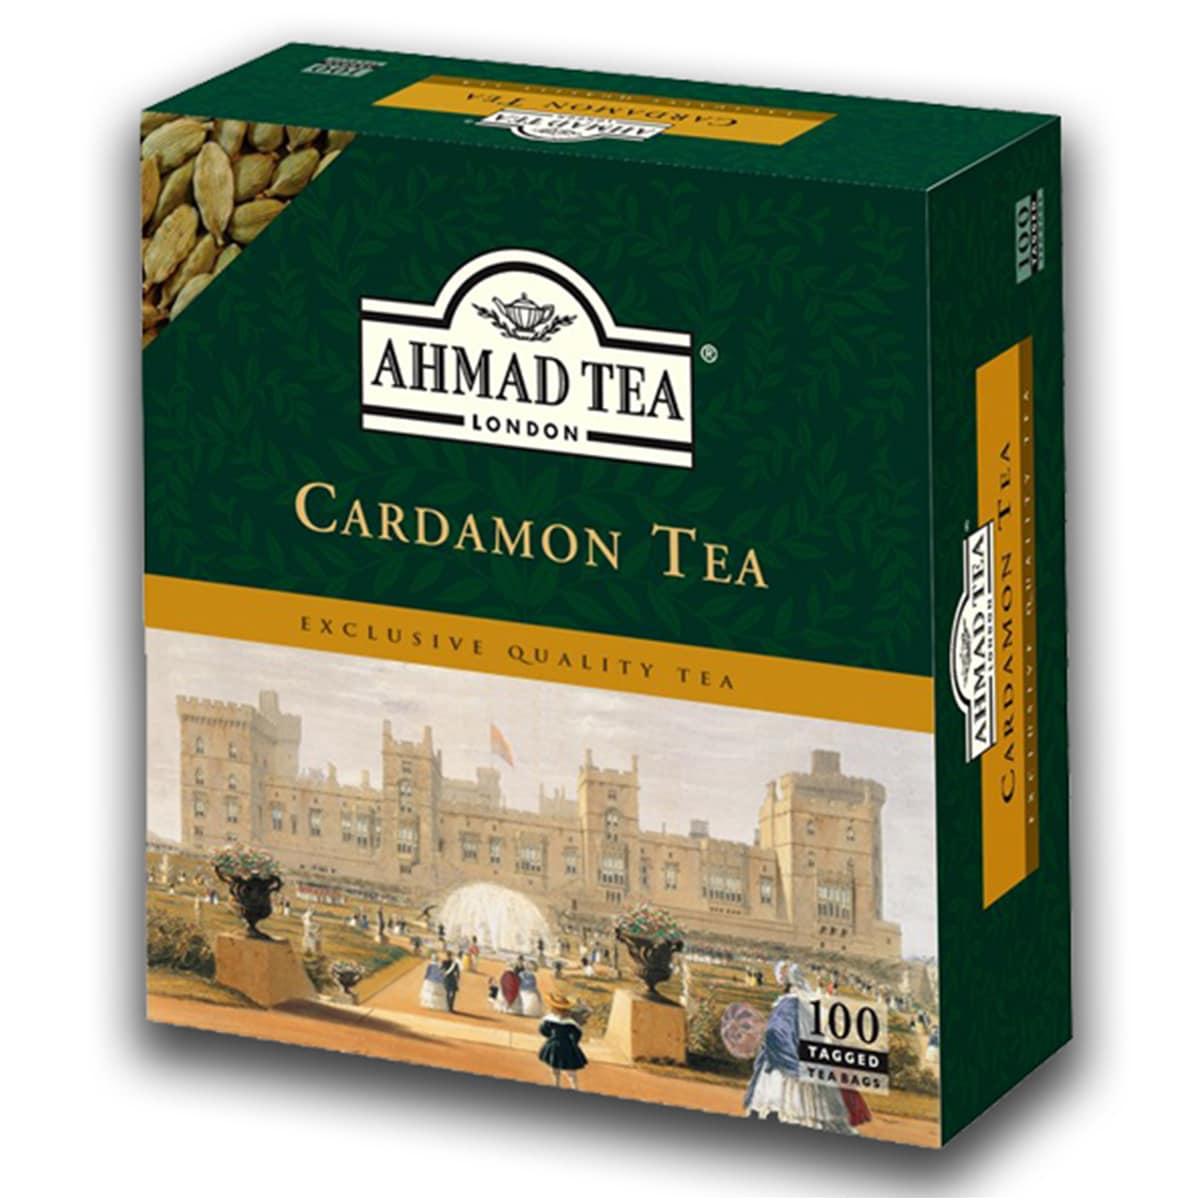 Buy Ahmad Tea London Cardamon Tea (100 Tagged Teabags) - 500 gm